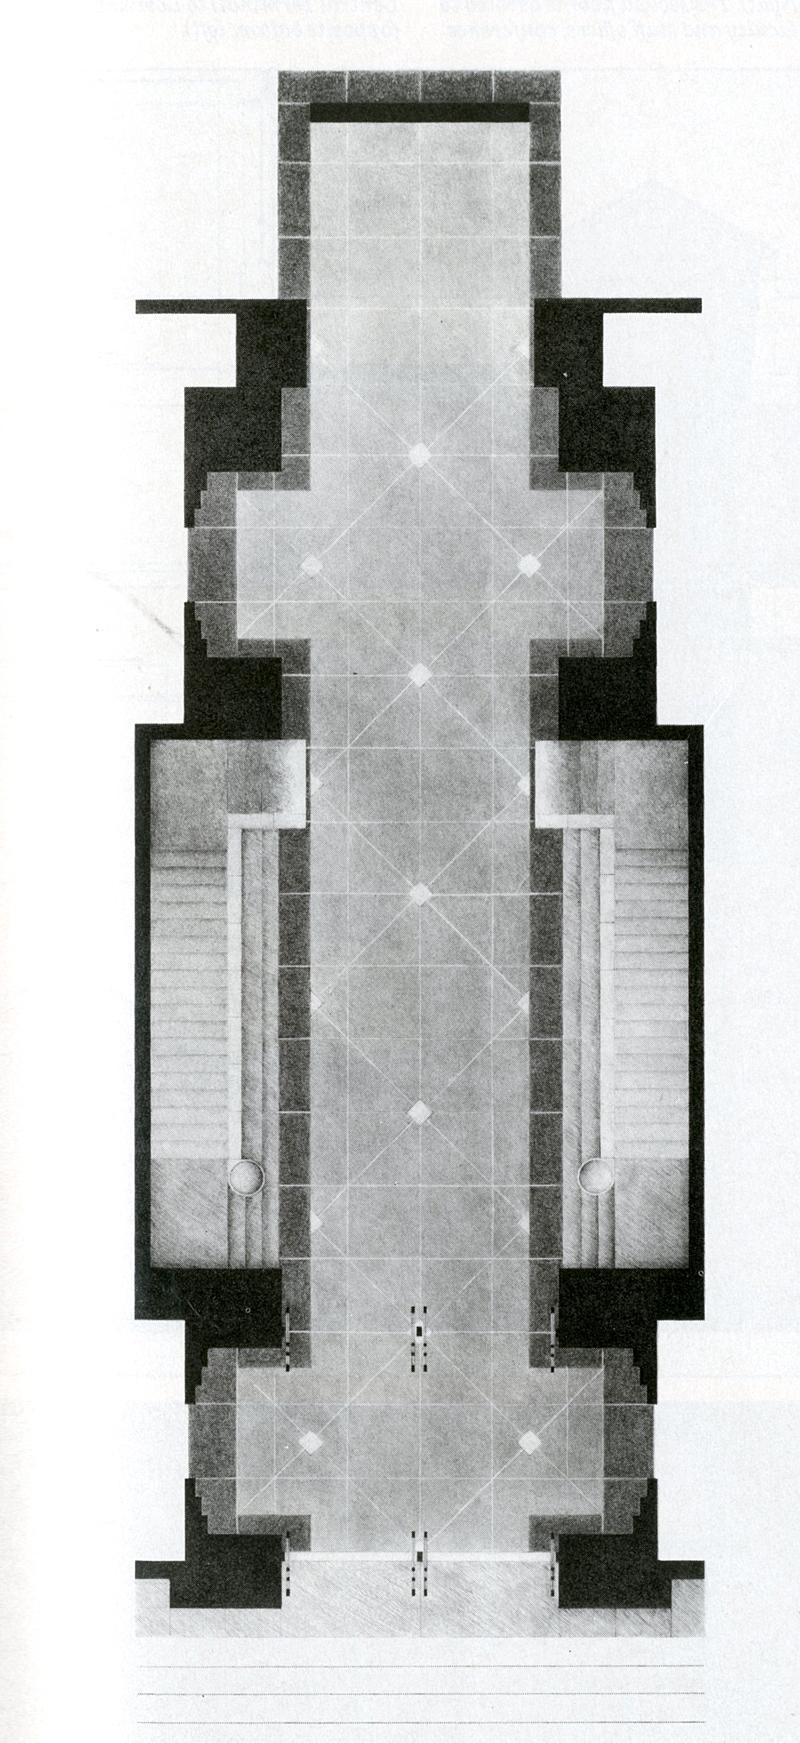 Peter L Gluck. Architectural Record 174 April 1986, 123